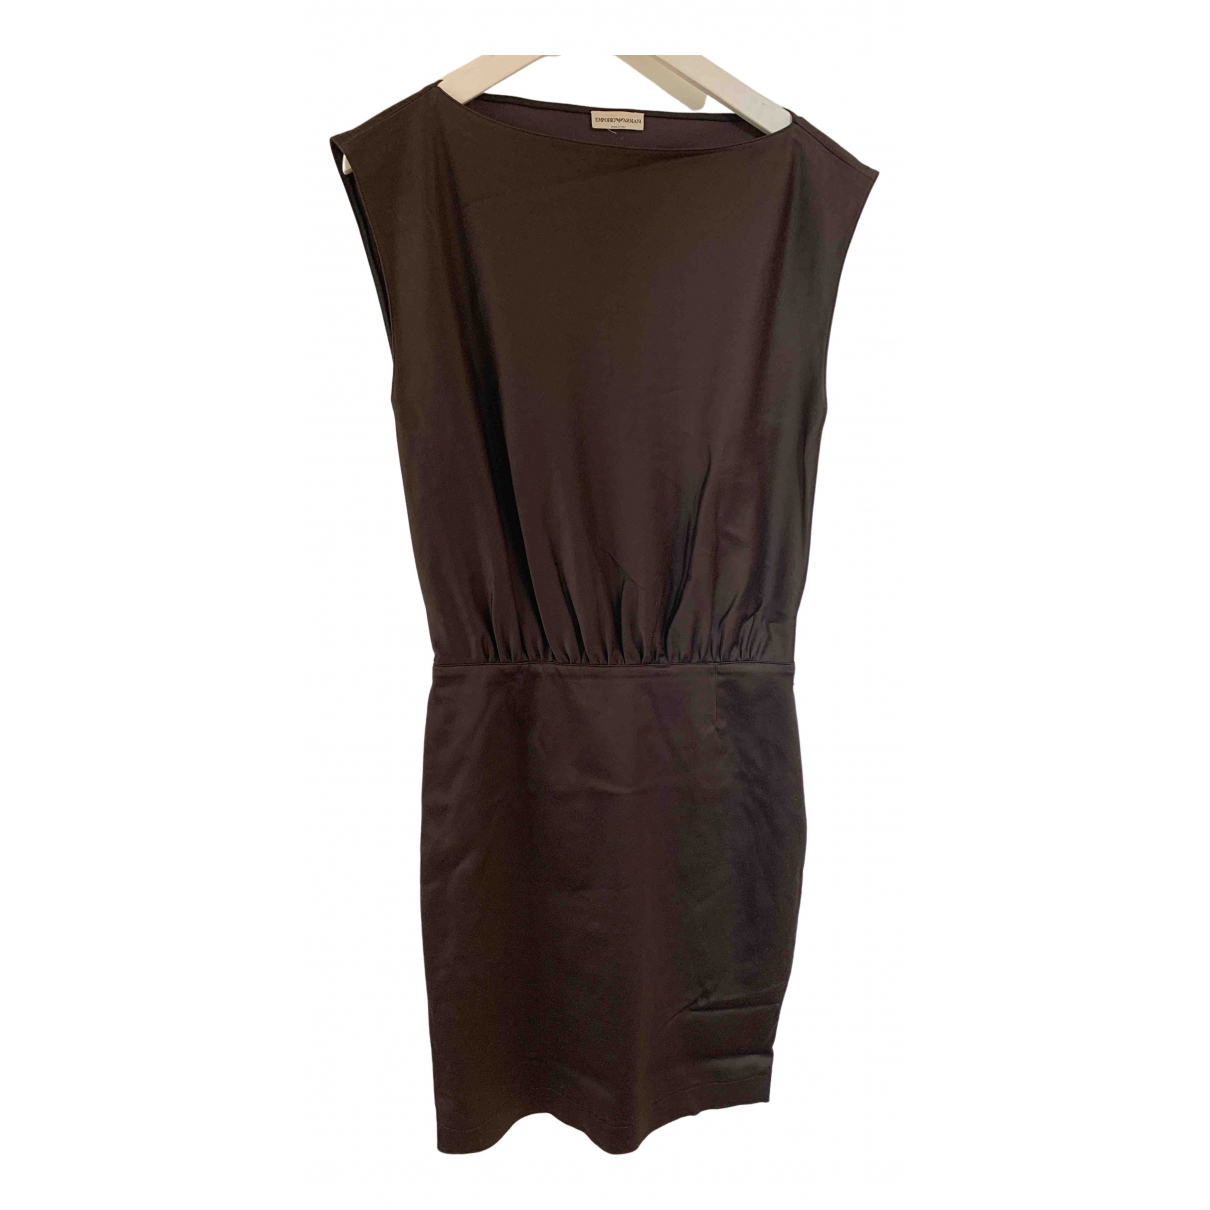 Emporio Armani \N Kleid in  Braun Synthetik